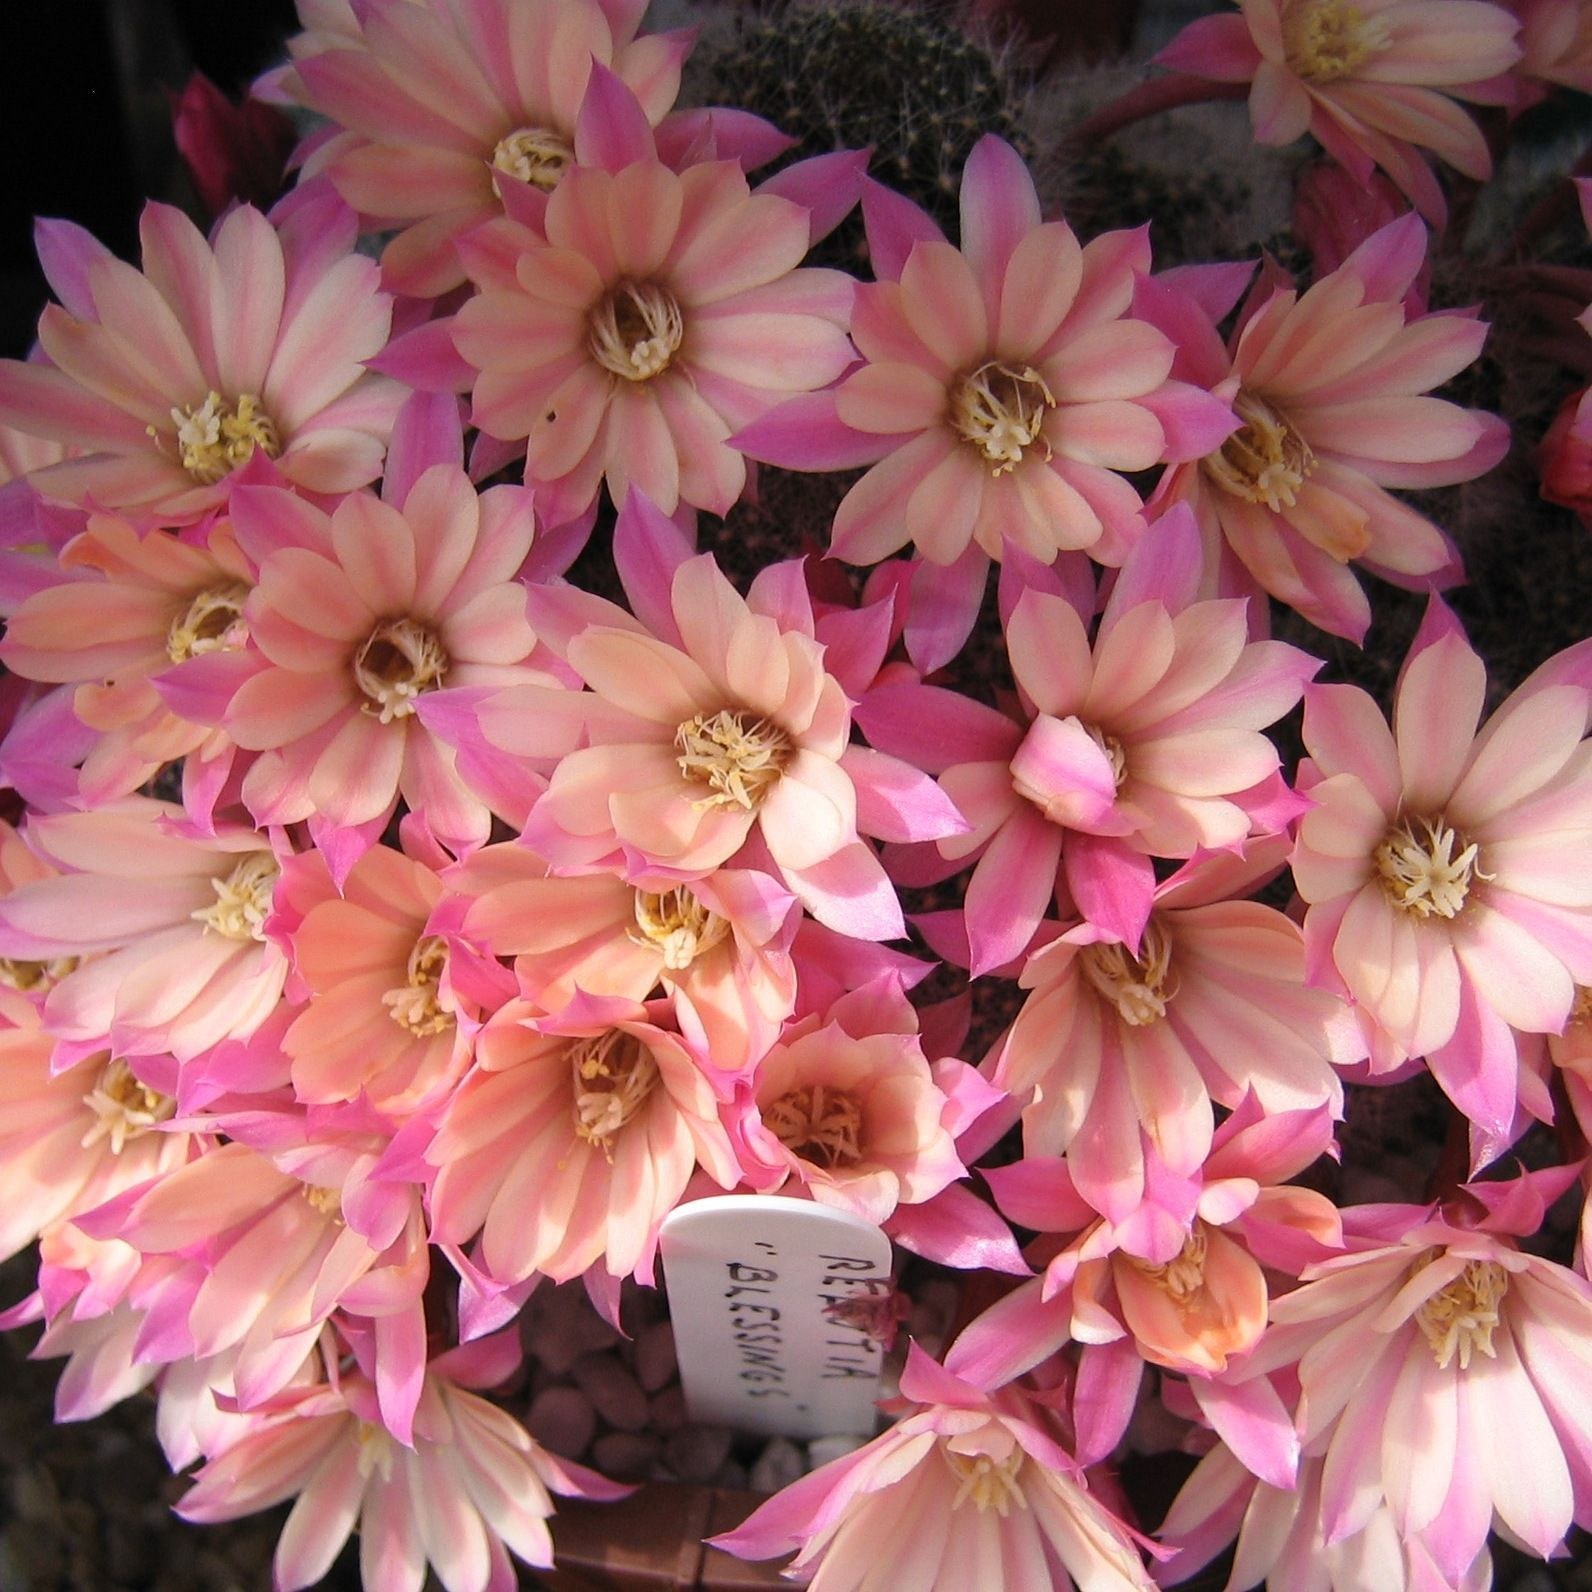 Rebutia Blessings A Hybrid Obviously But Very Pretty Flower